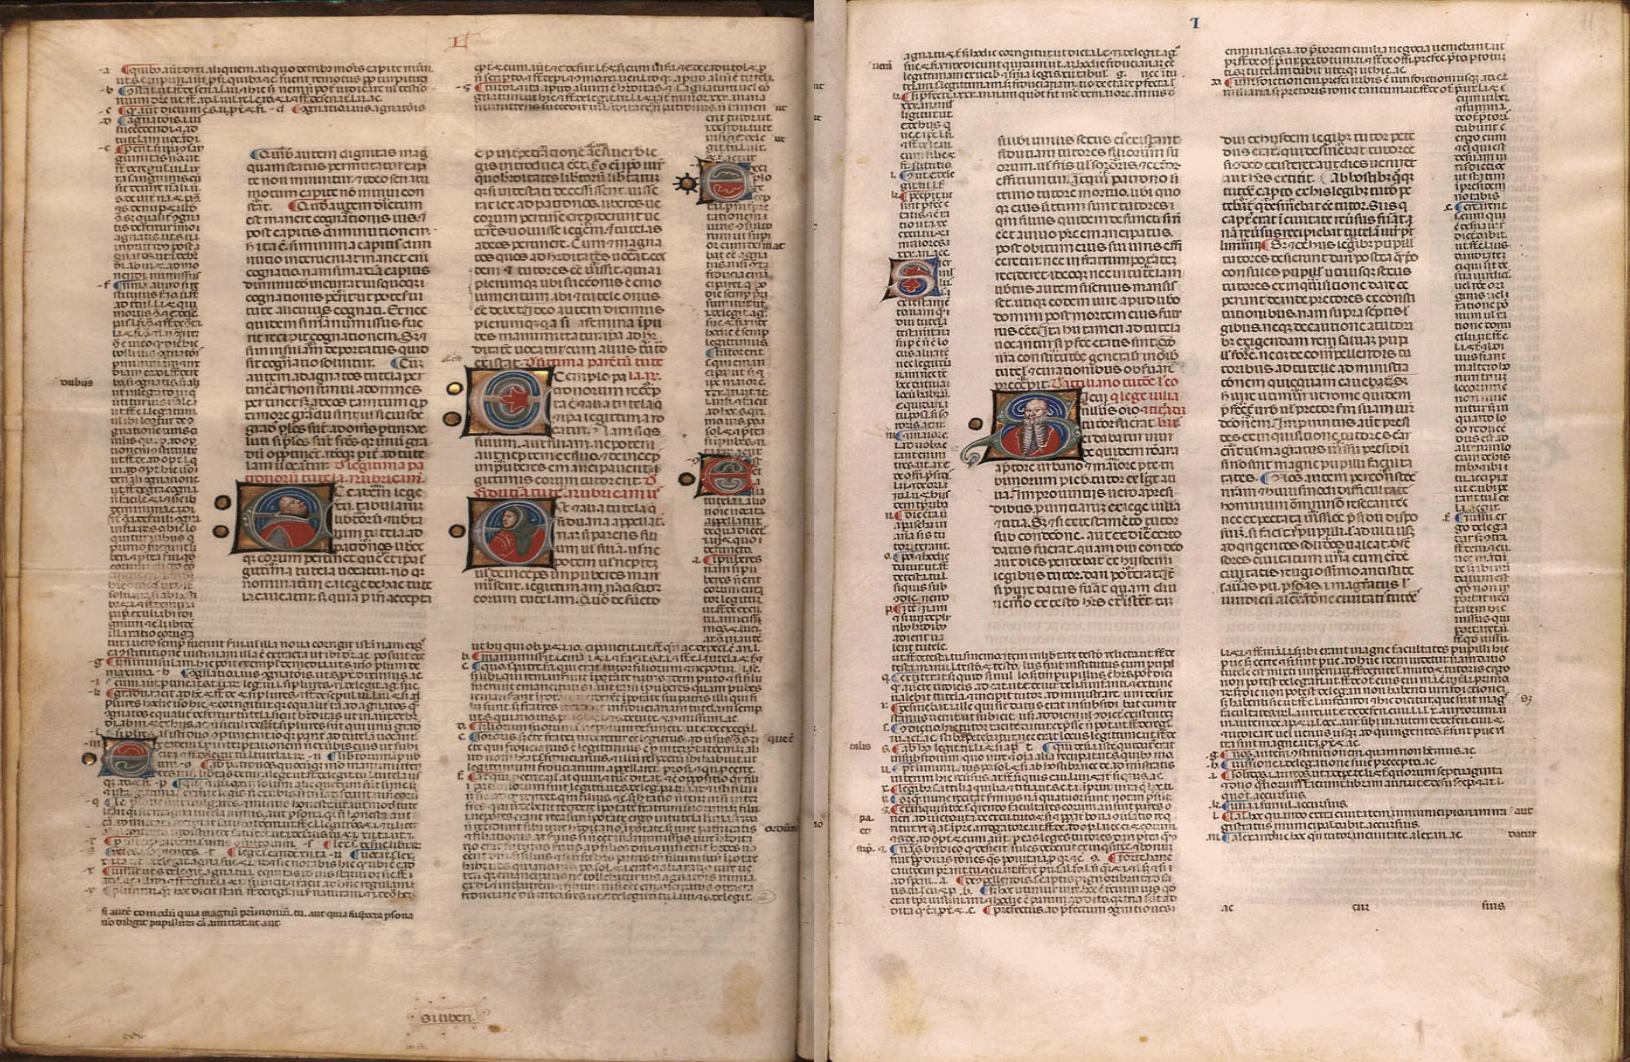 Malatestiana Cesena manoscritti online